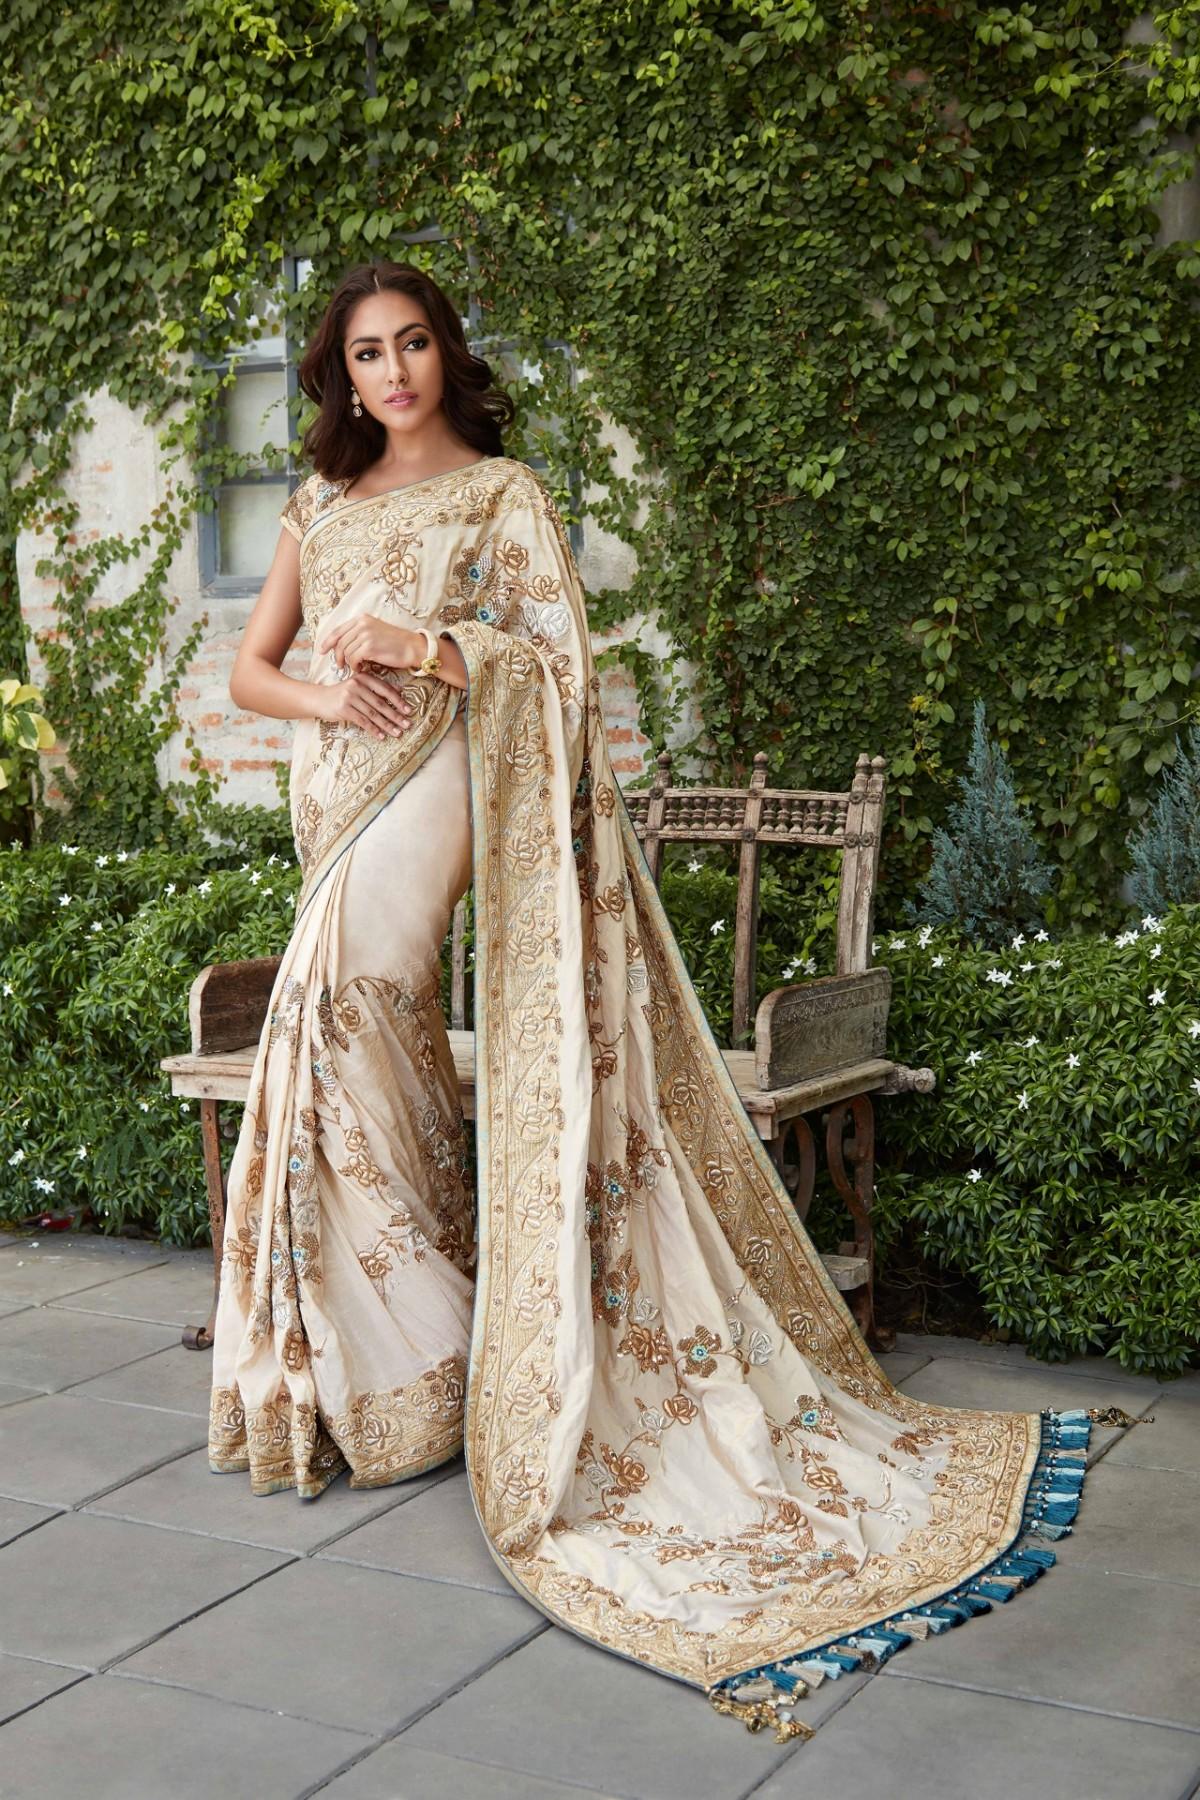 Free Images  spring wedding dress bride textile sari